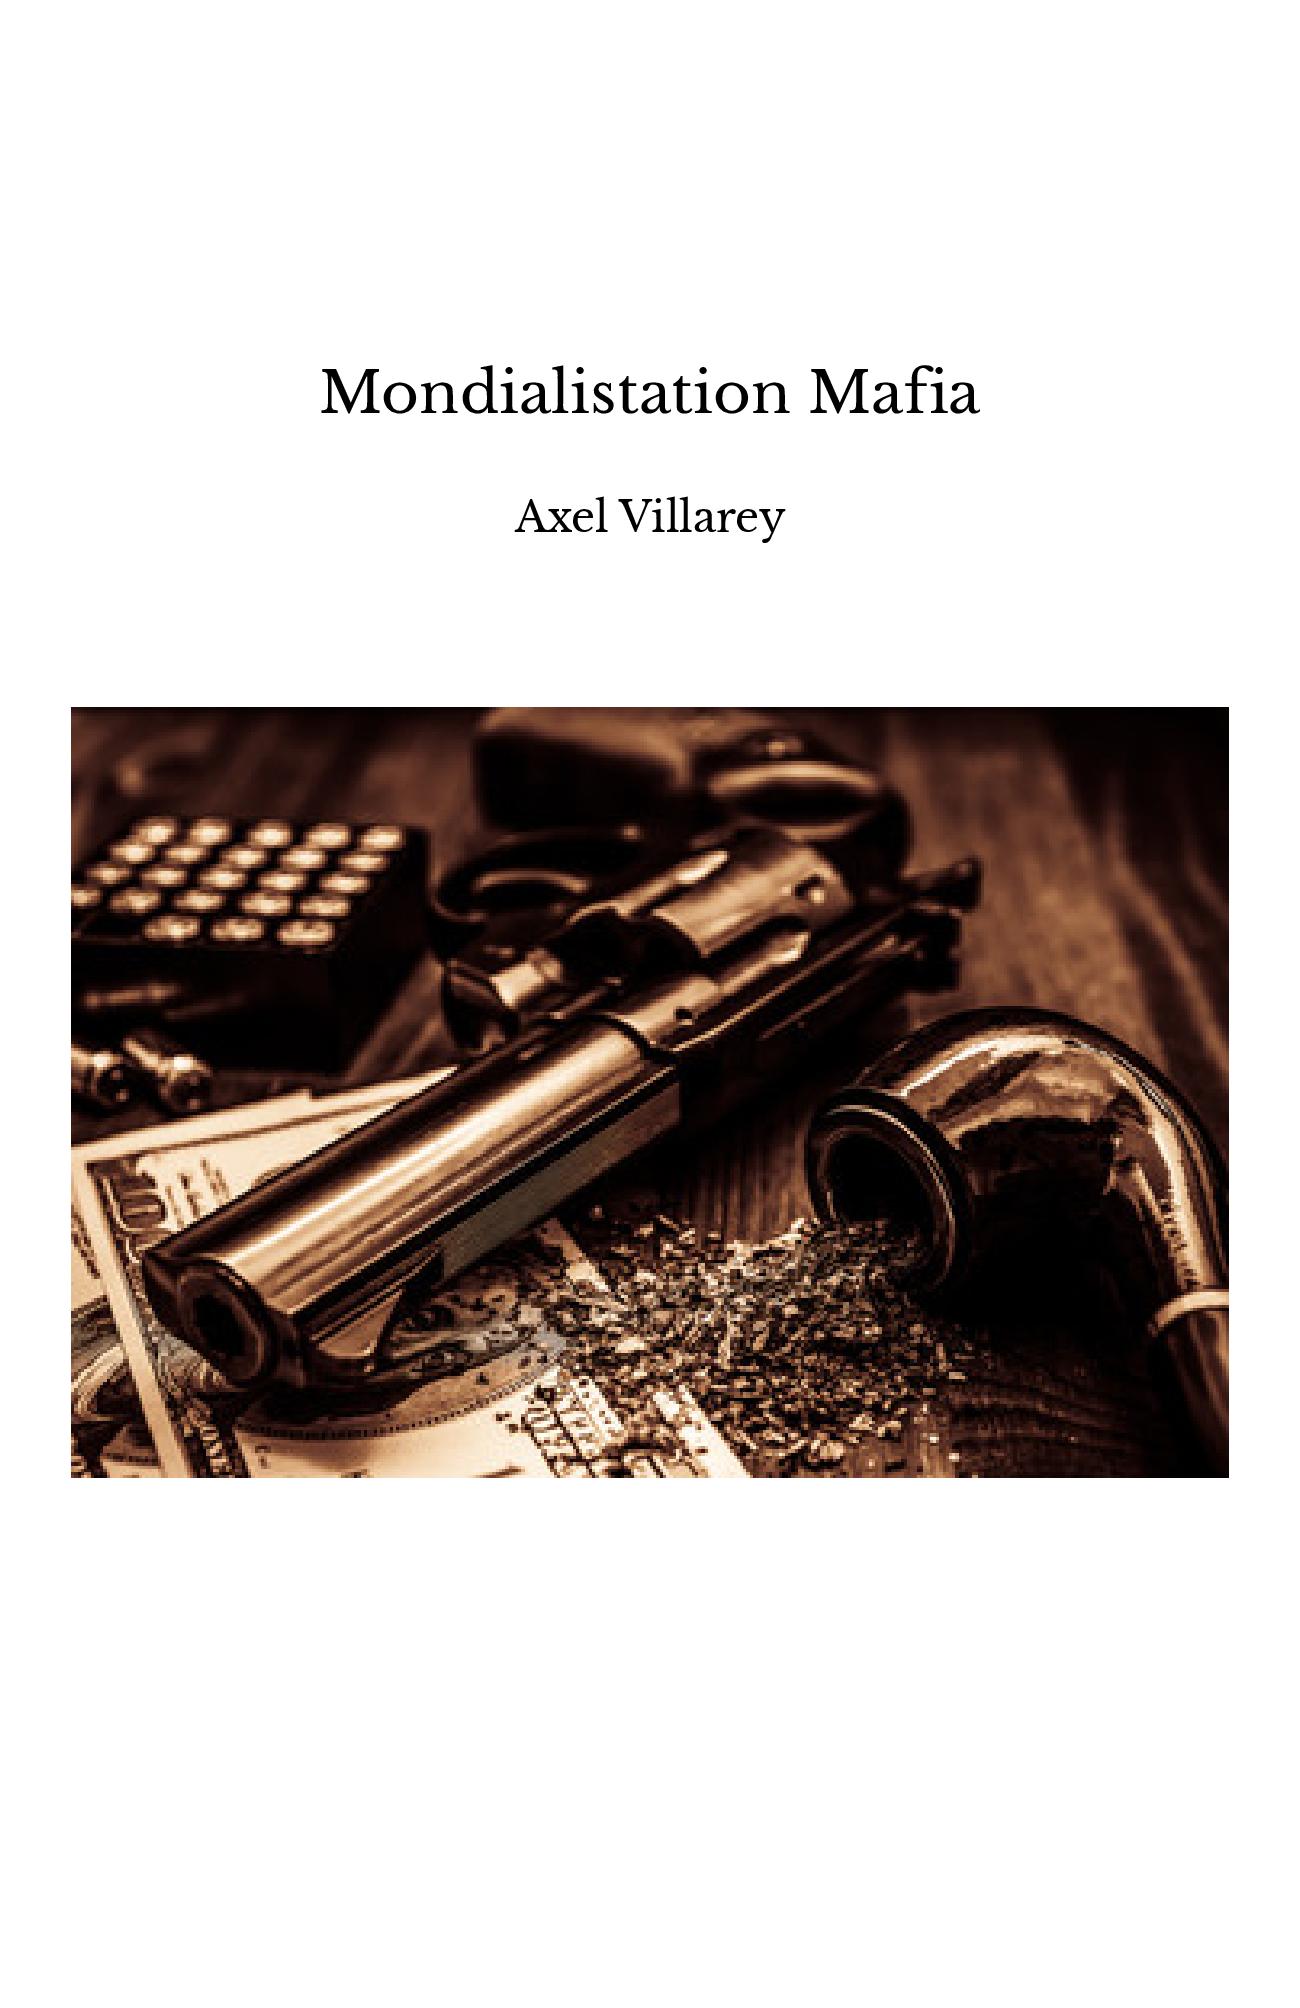 Mondialistation Mafia